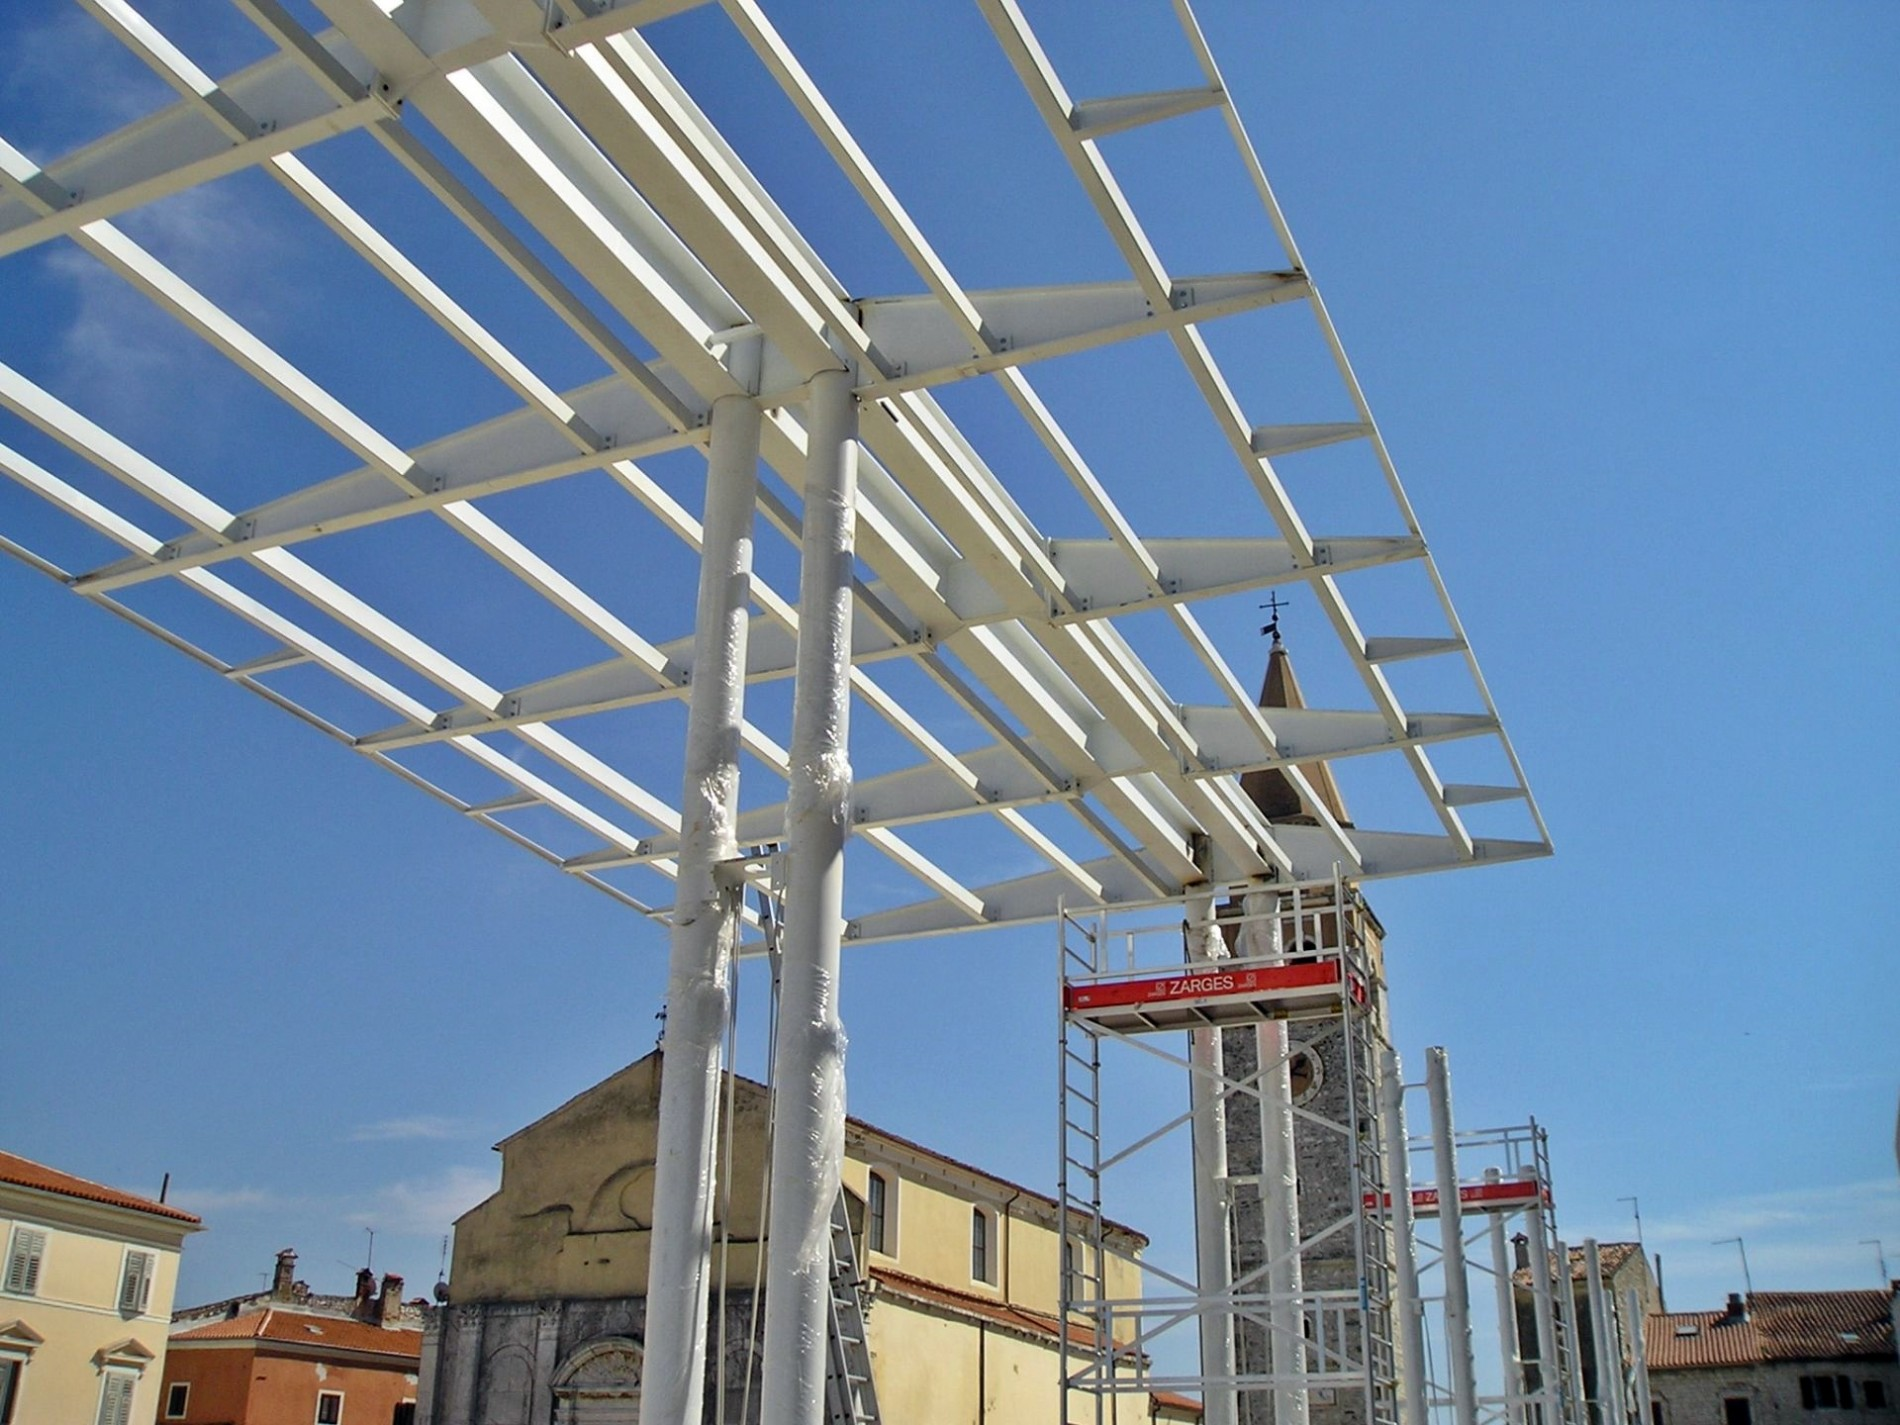 središnji gradski trg u umagu, umag, središnji trg, gradski trg, main square in umag, structure, nenad fabijanić, konstrukcija, upi-2m